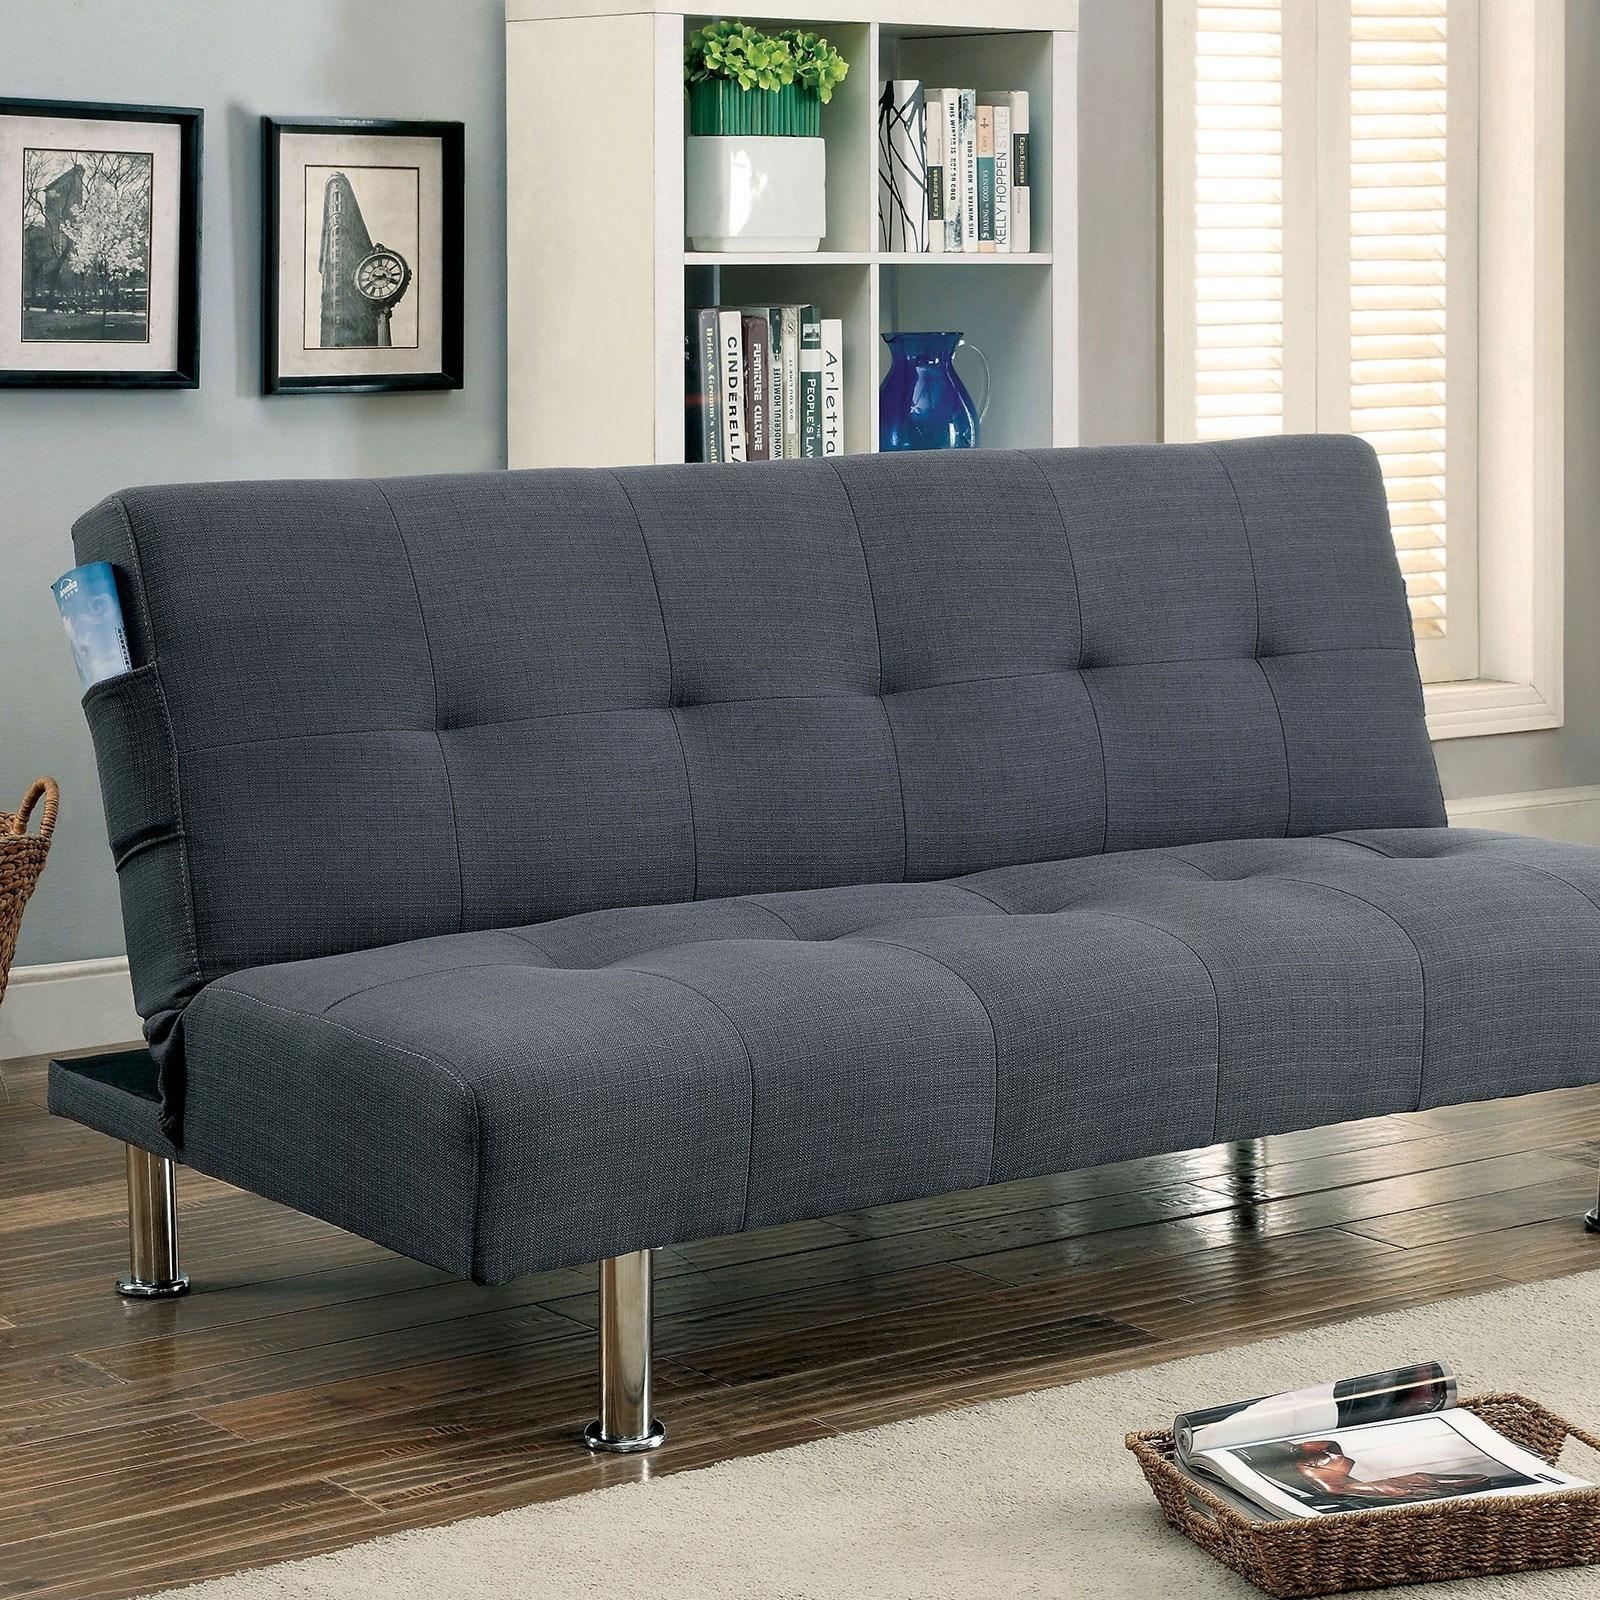 Dewey Futon Sofa by Furniture of America at Corner Furniture